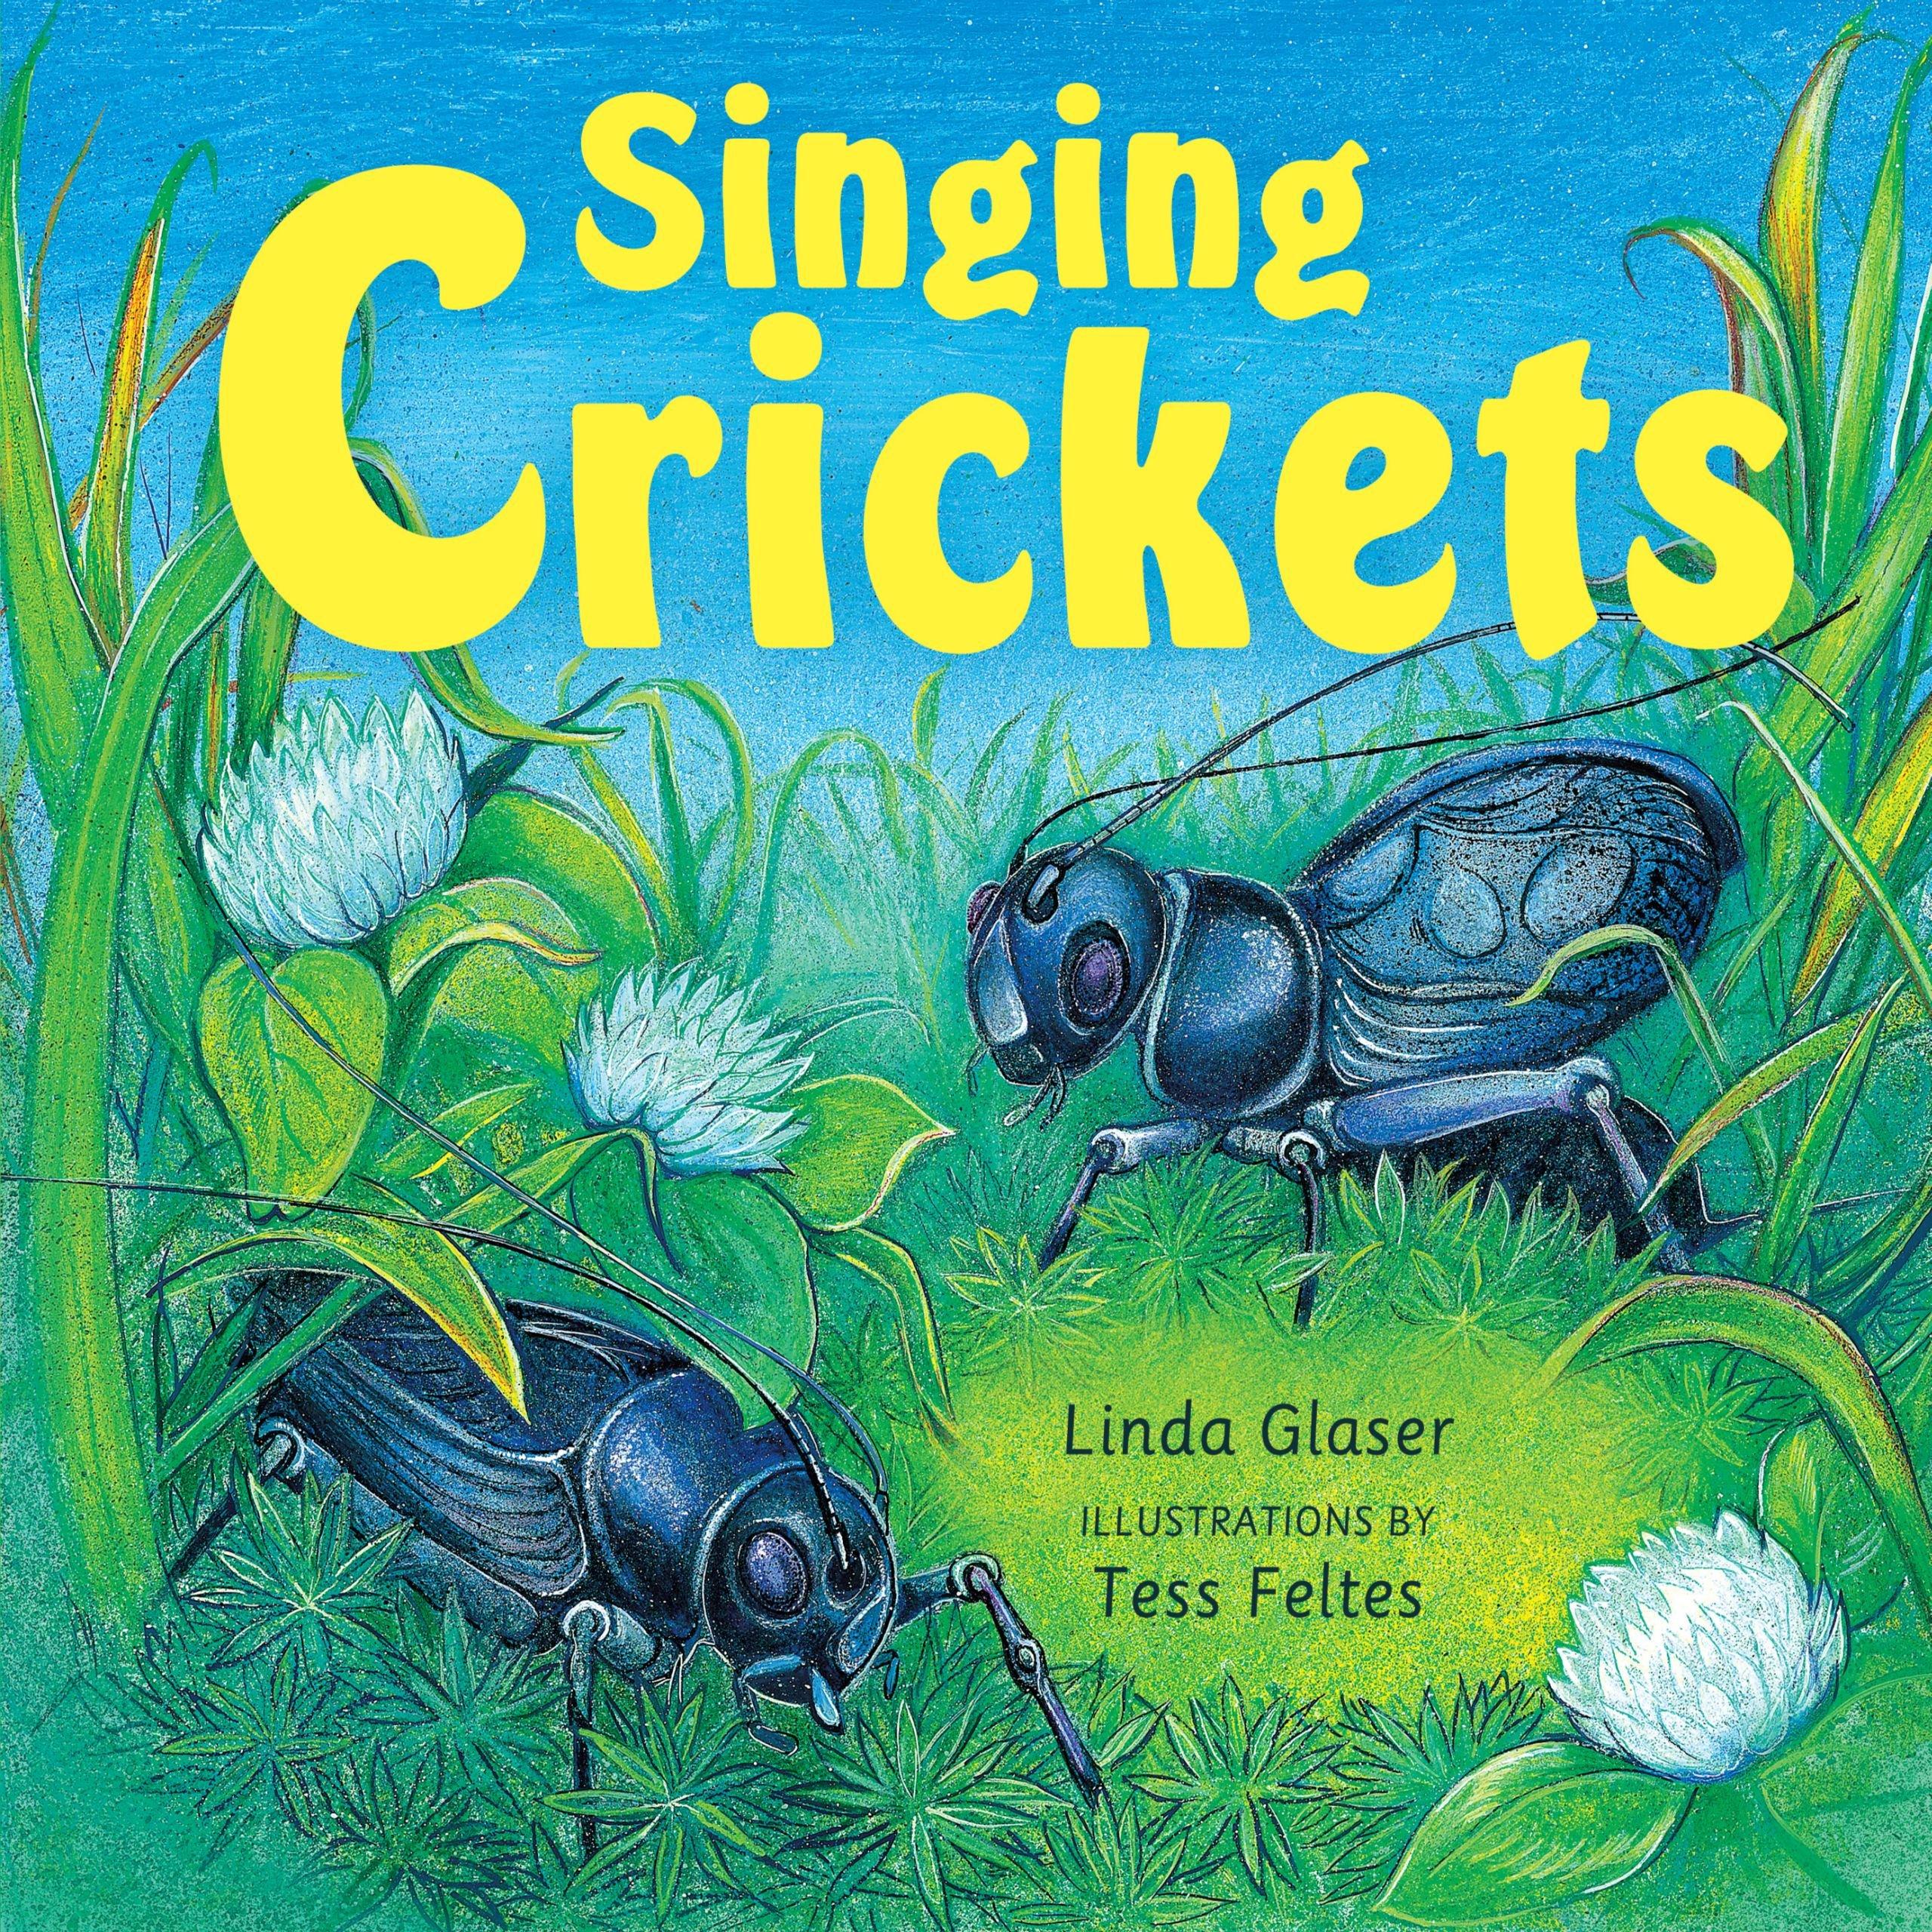 Download Singing Crickets (Linda Glaser's Classic Creatures) ebook